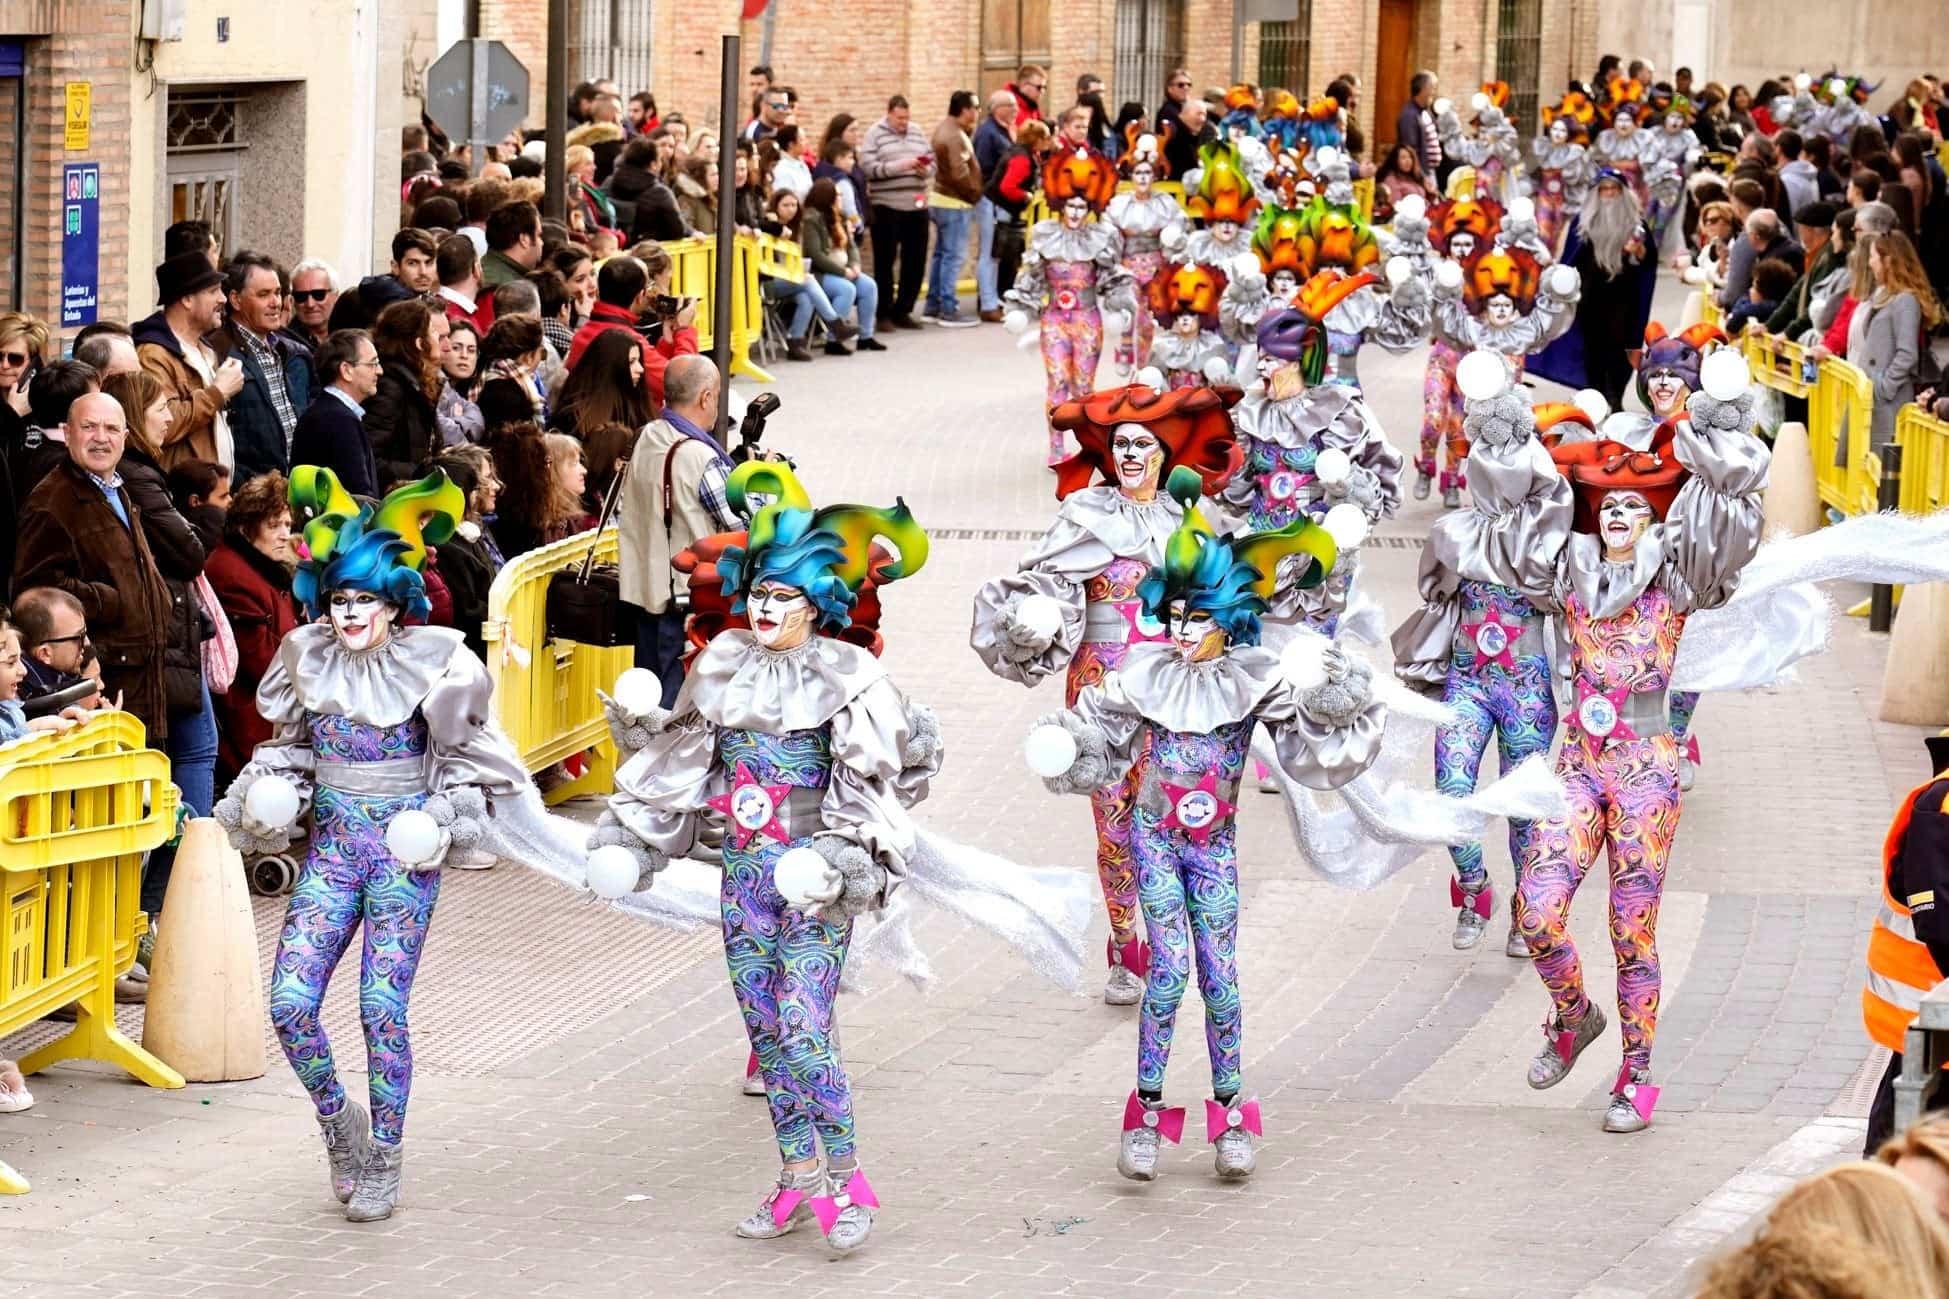 Carnaval de herencia 2020 ofertorio 151 - Selección de fotografías del Ofertorio del Carnaval de Herencia